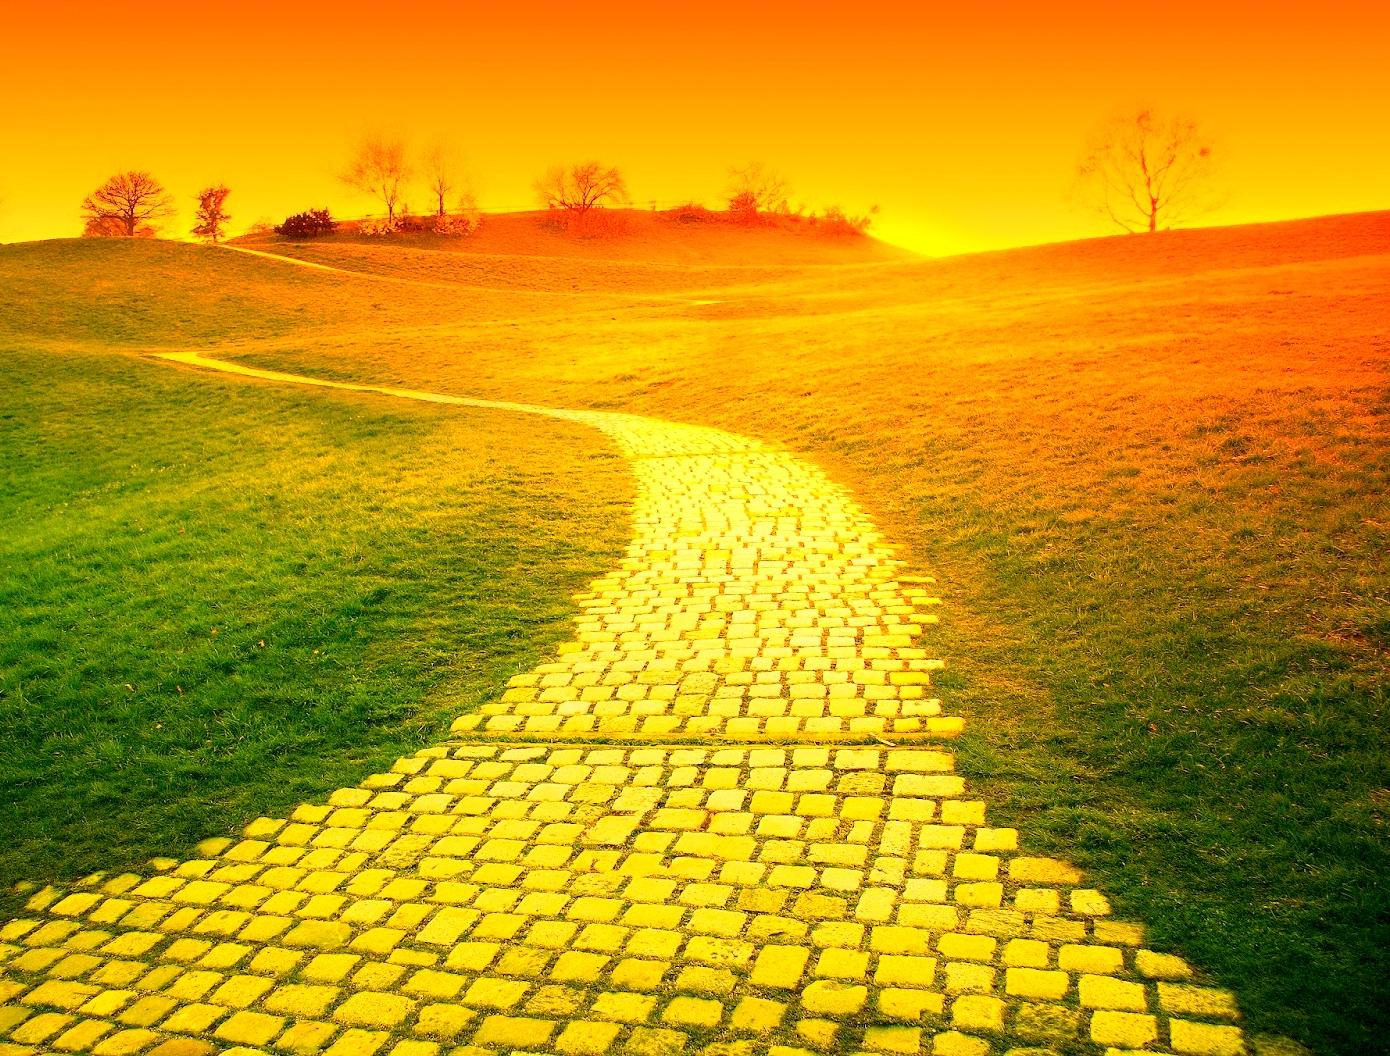 Yellow Brick Road Background